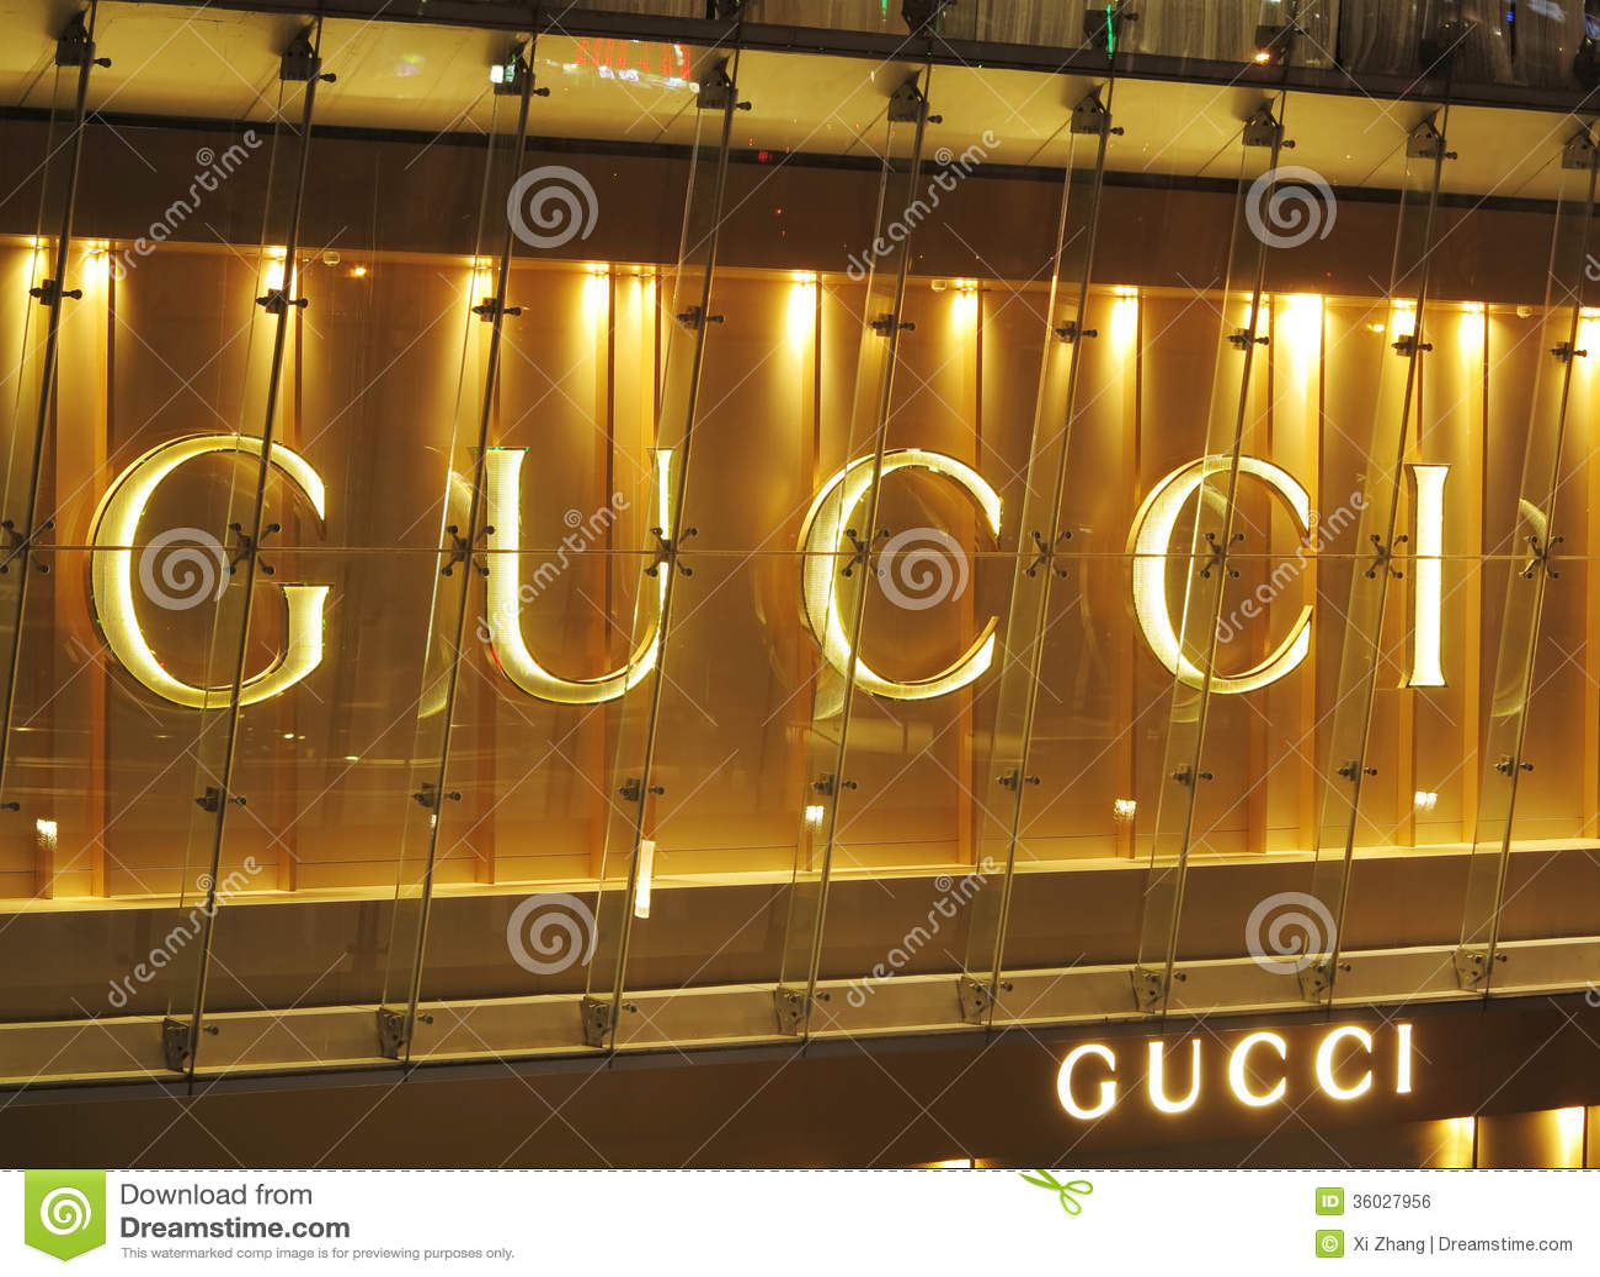 Designer Fashion Online Store. Gucci Clothing